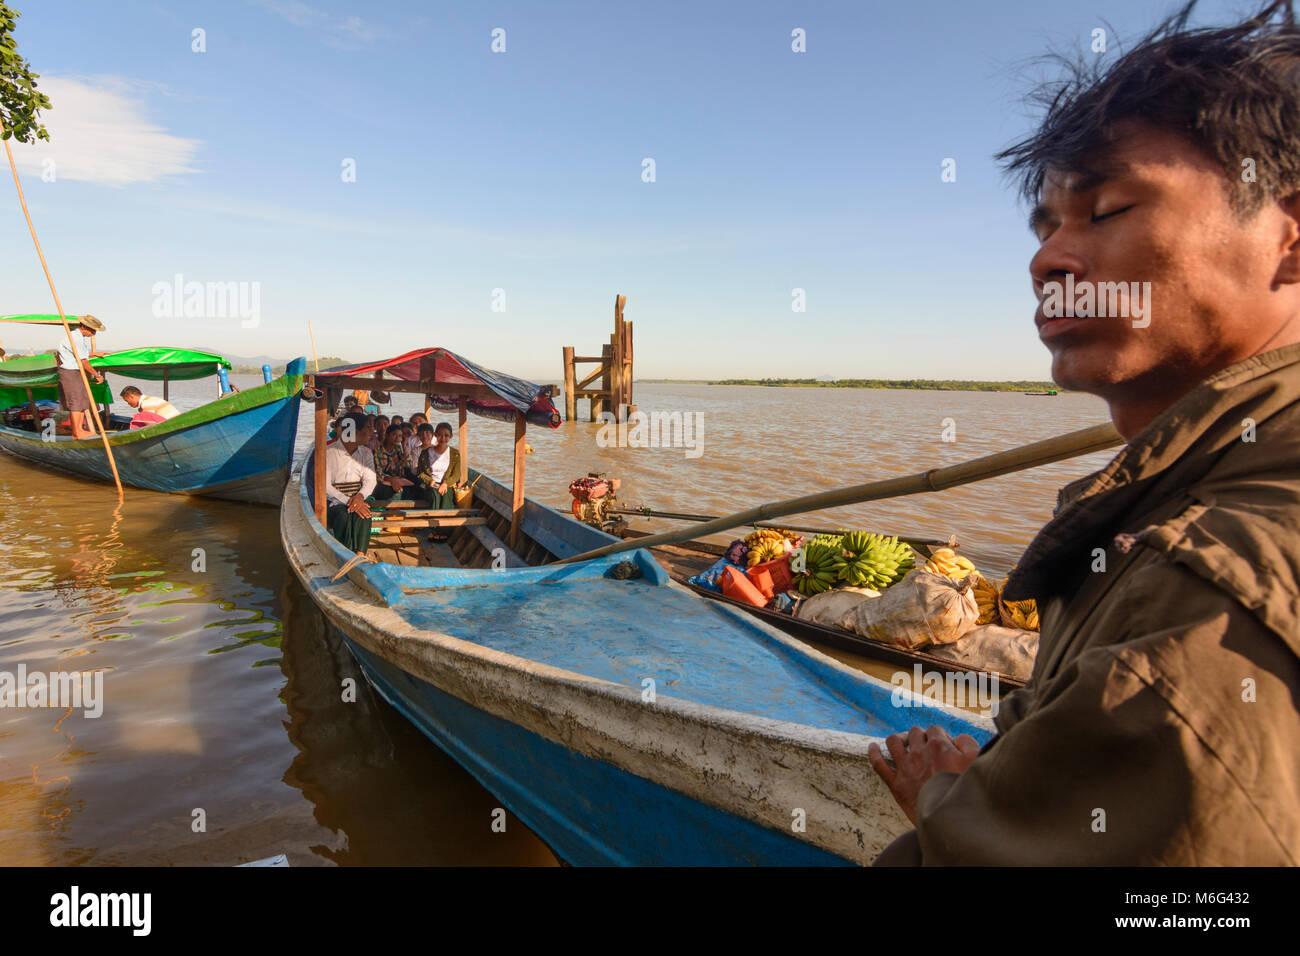 Mawlamyine (Mawlamyaing, Moulmein): ferry boat, Thanlwin (Salween) River, , Mon State, Myanmar (Burma) Stock Photo